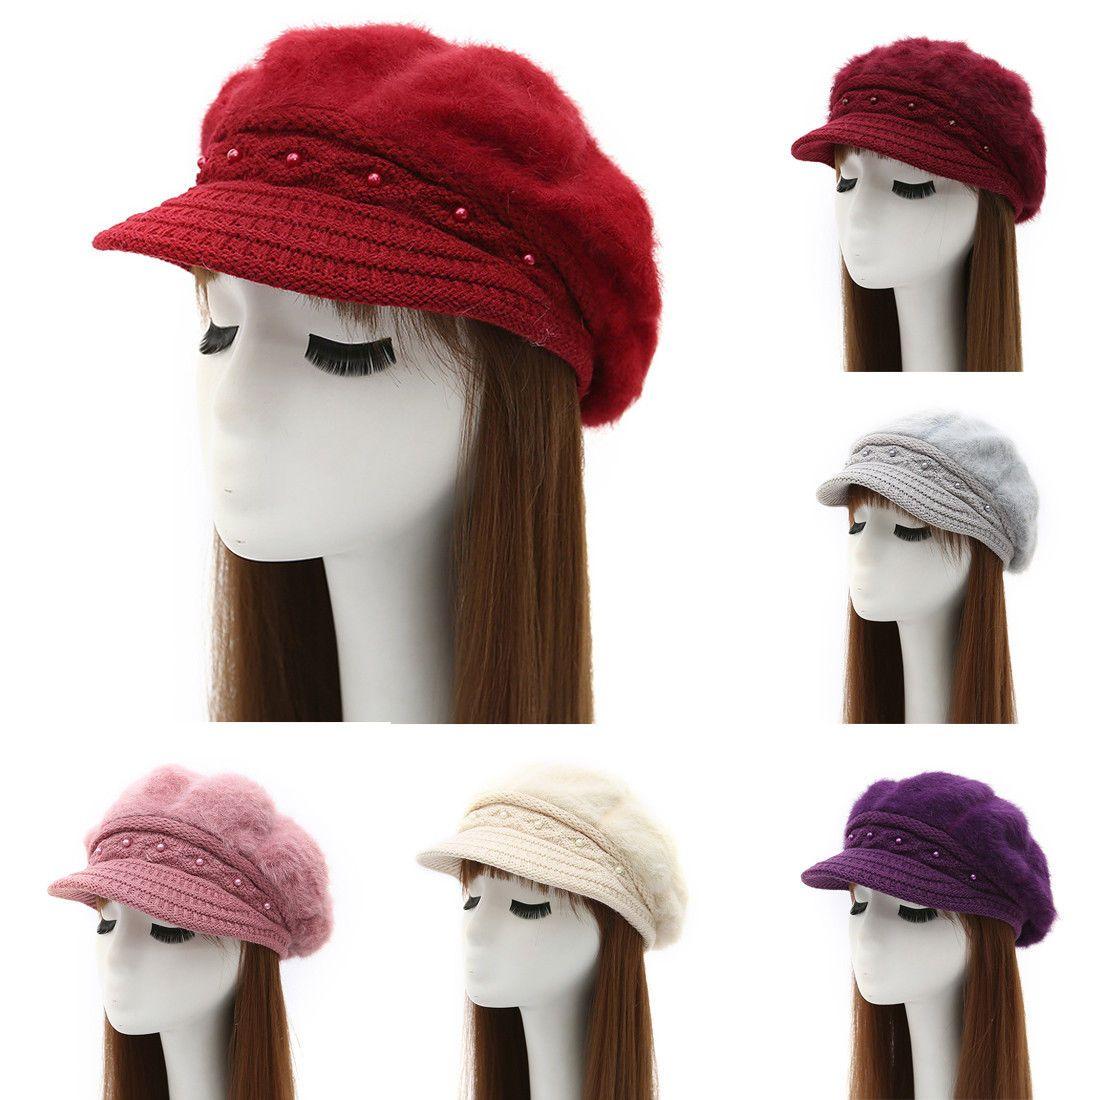 Fashion Winter Warm Solid Color Women Pearl Knit Beanie Hat Berets  Casquette Cap c91ac34f5a6d